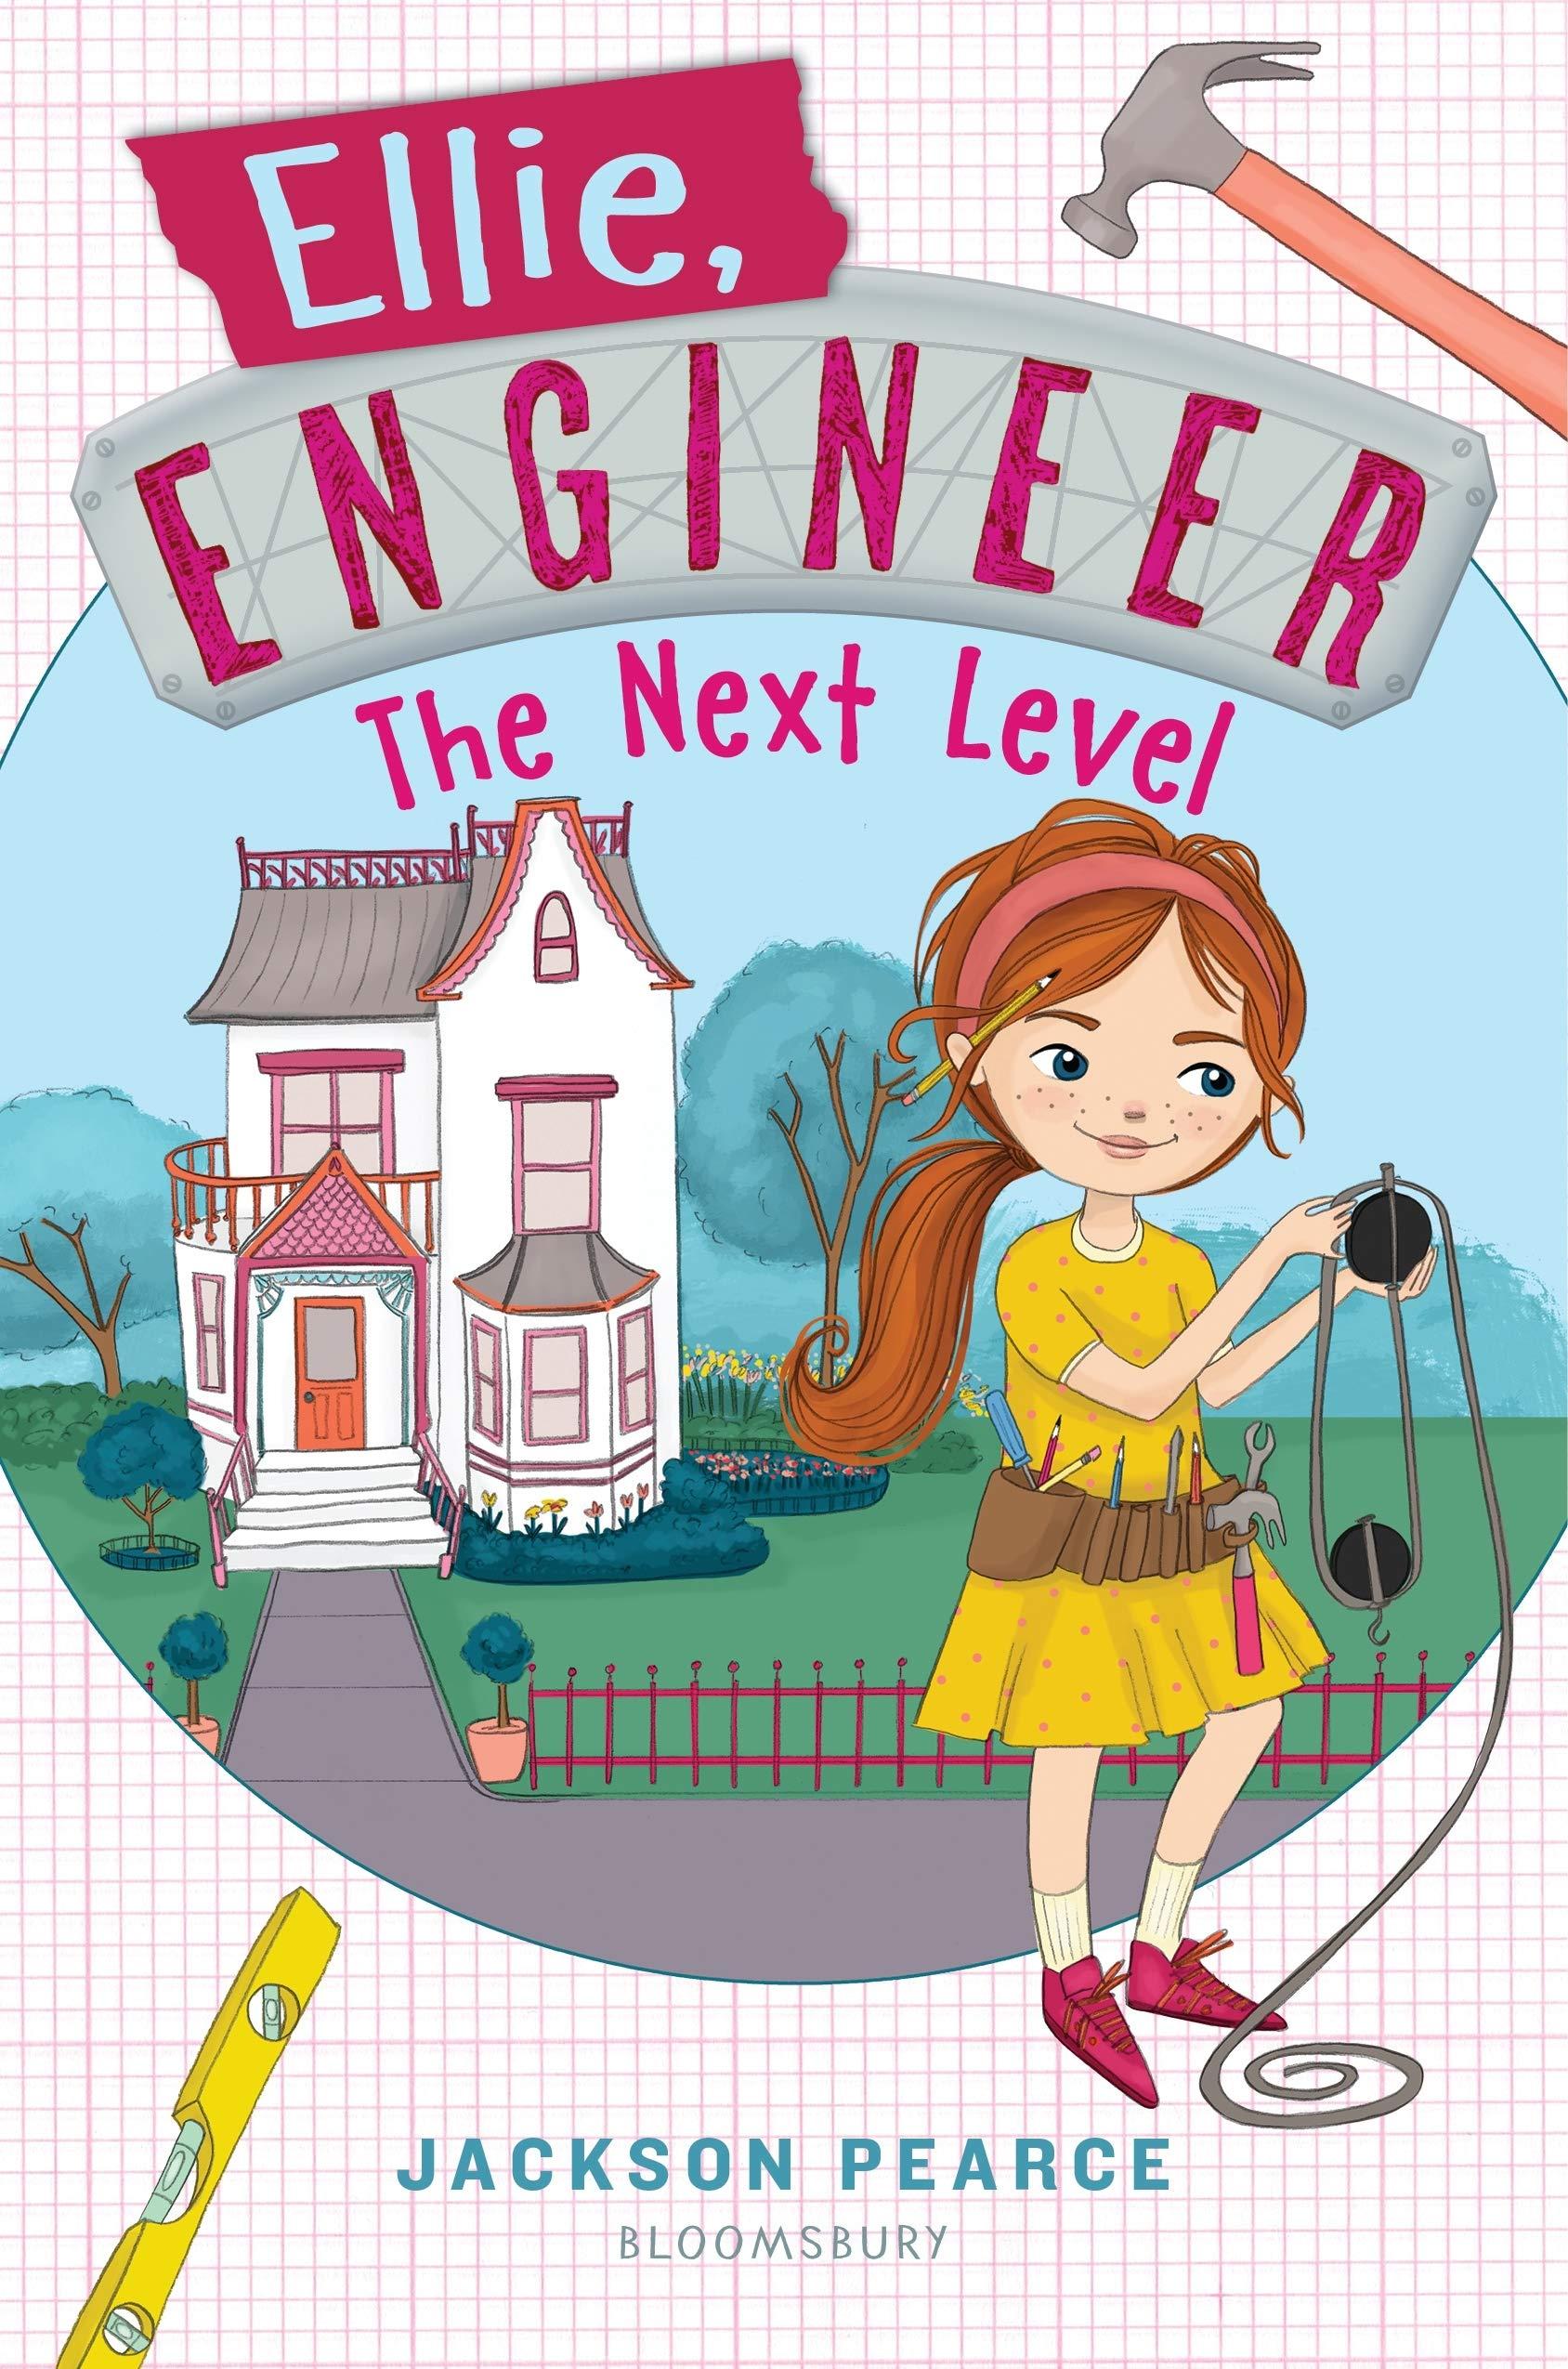 Ellie Engineer: The Next Level